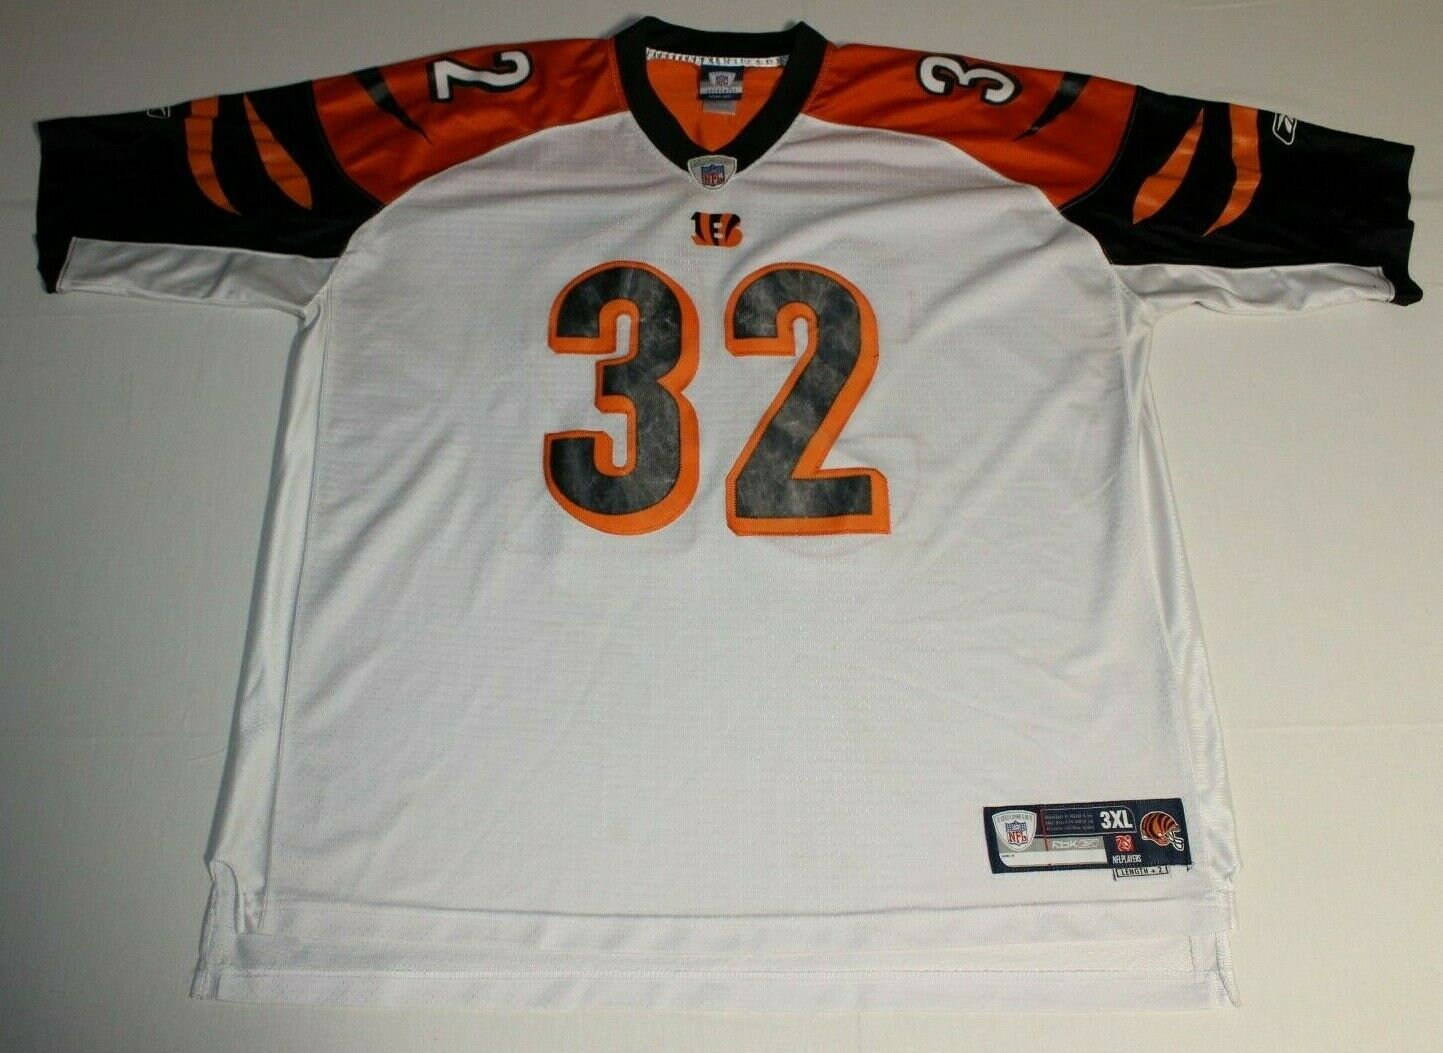 NFL Football Cincinnati Bengals Rudi Johnson #32 Sewn Jersey 3XL XXXL Reebok Make Me An Offer! (**Free Shipping in USA & Canada**)